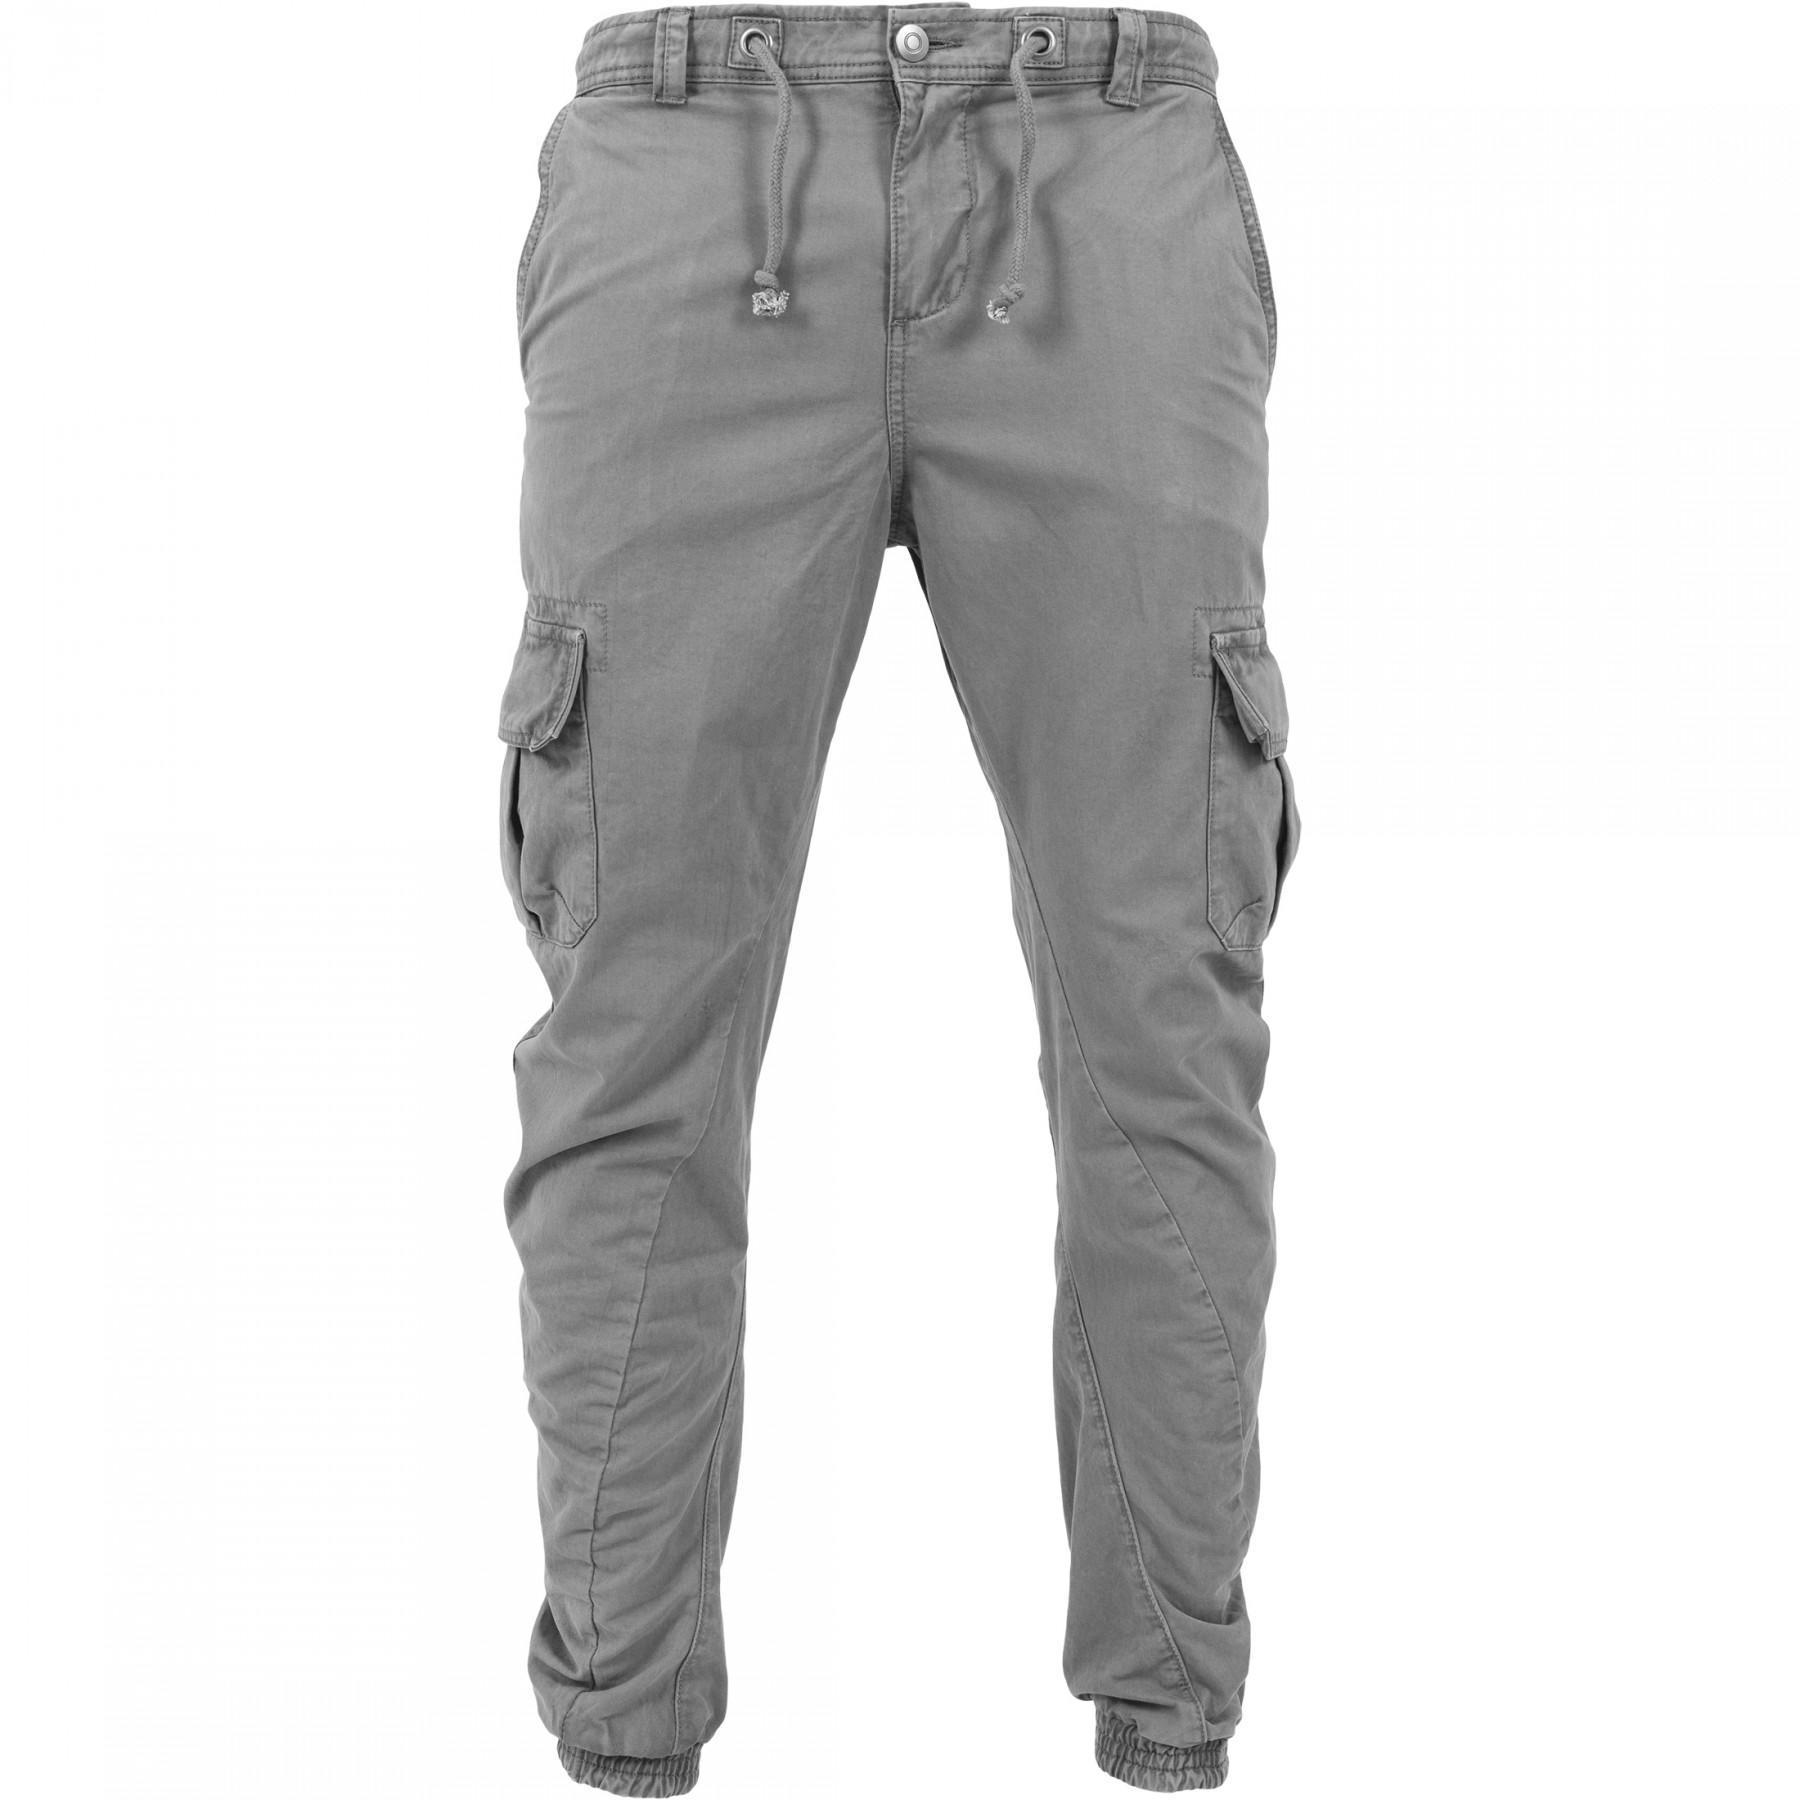 Urban Classics Cargo Pants